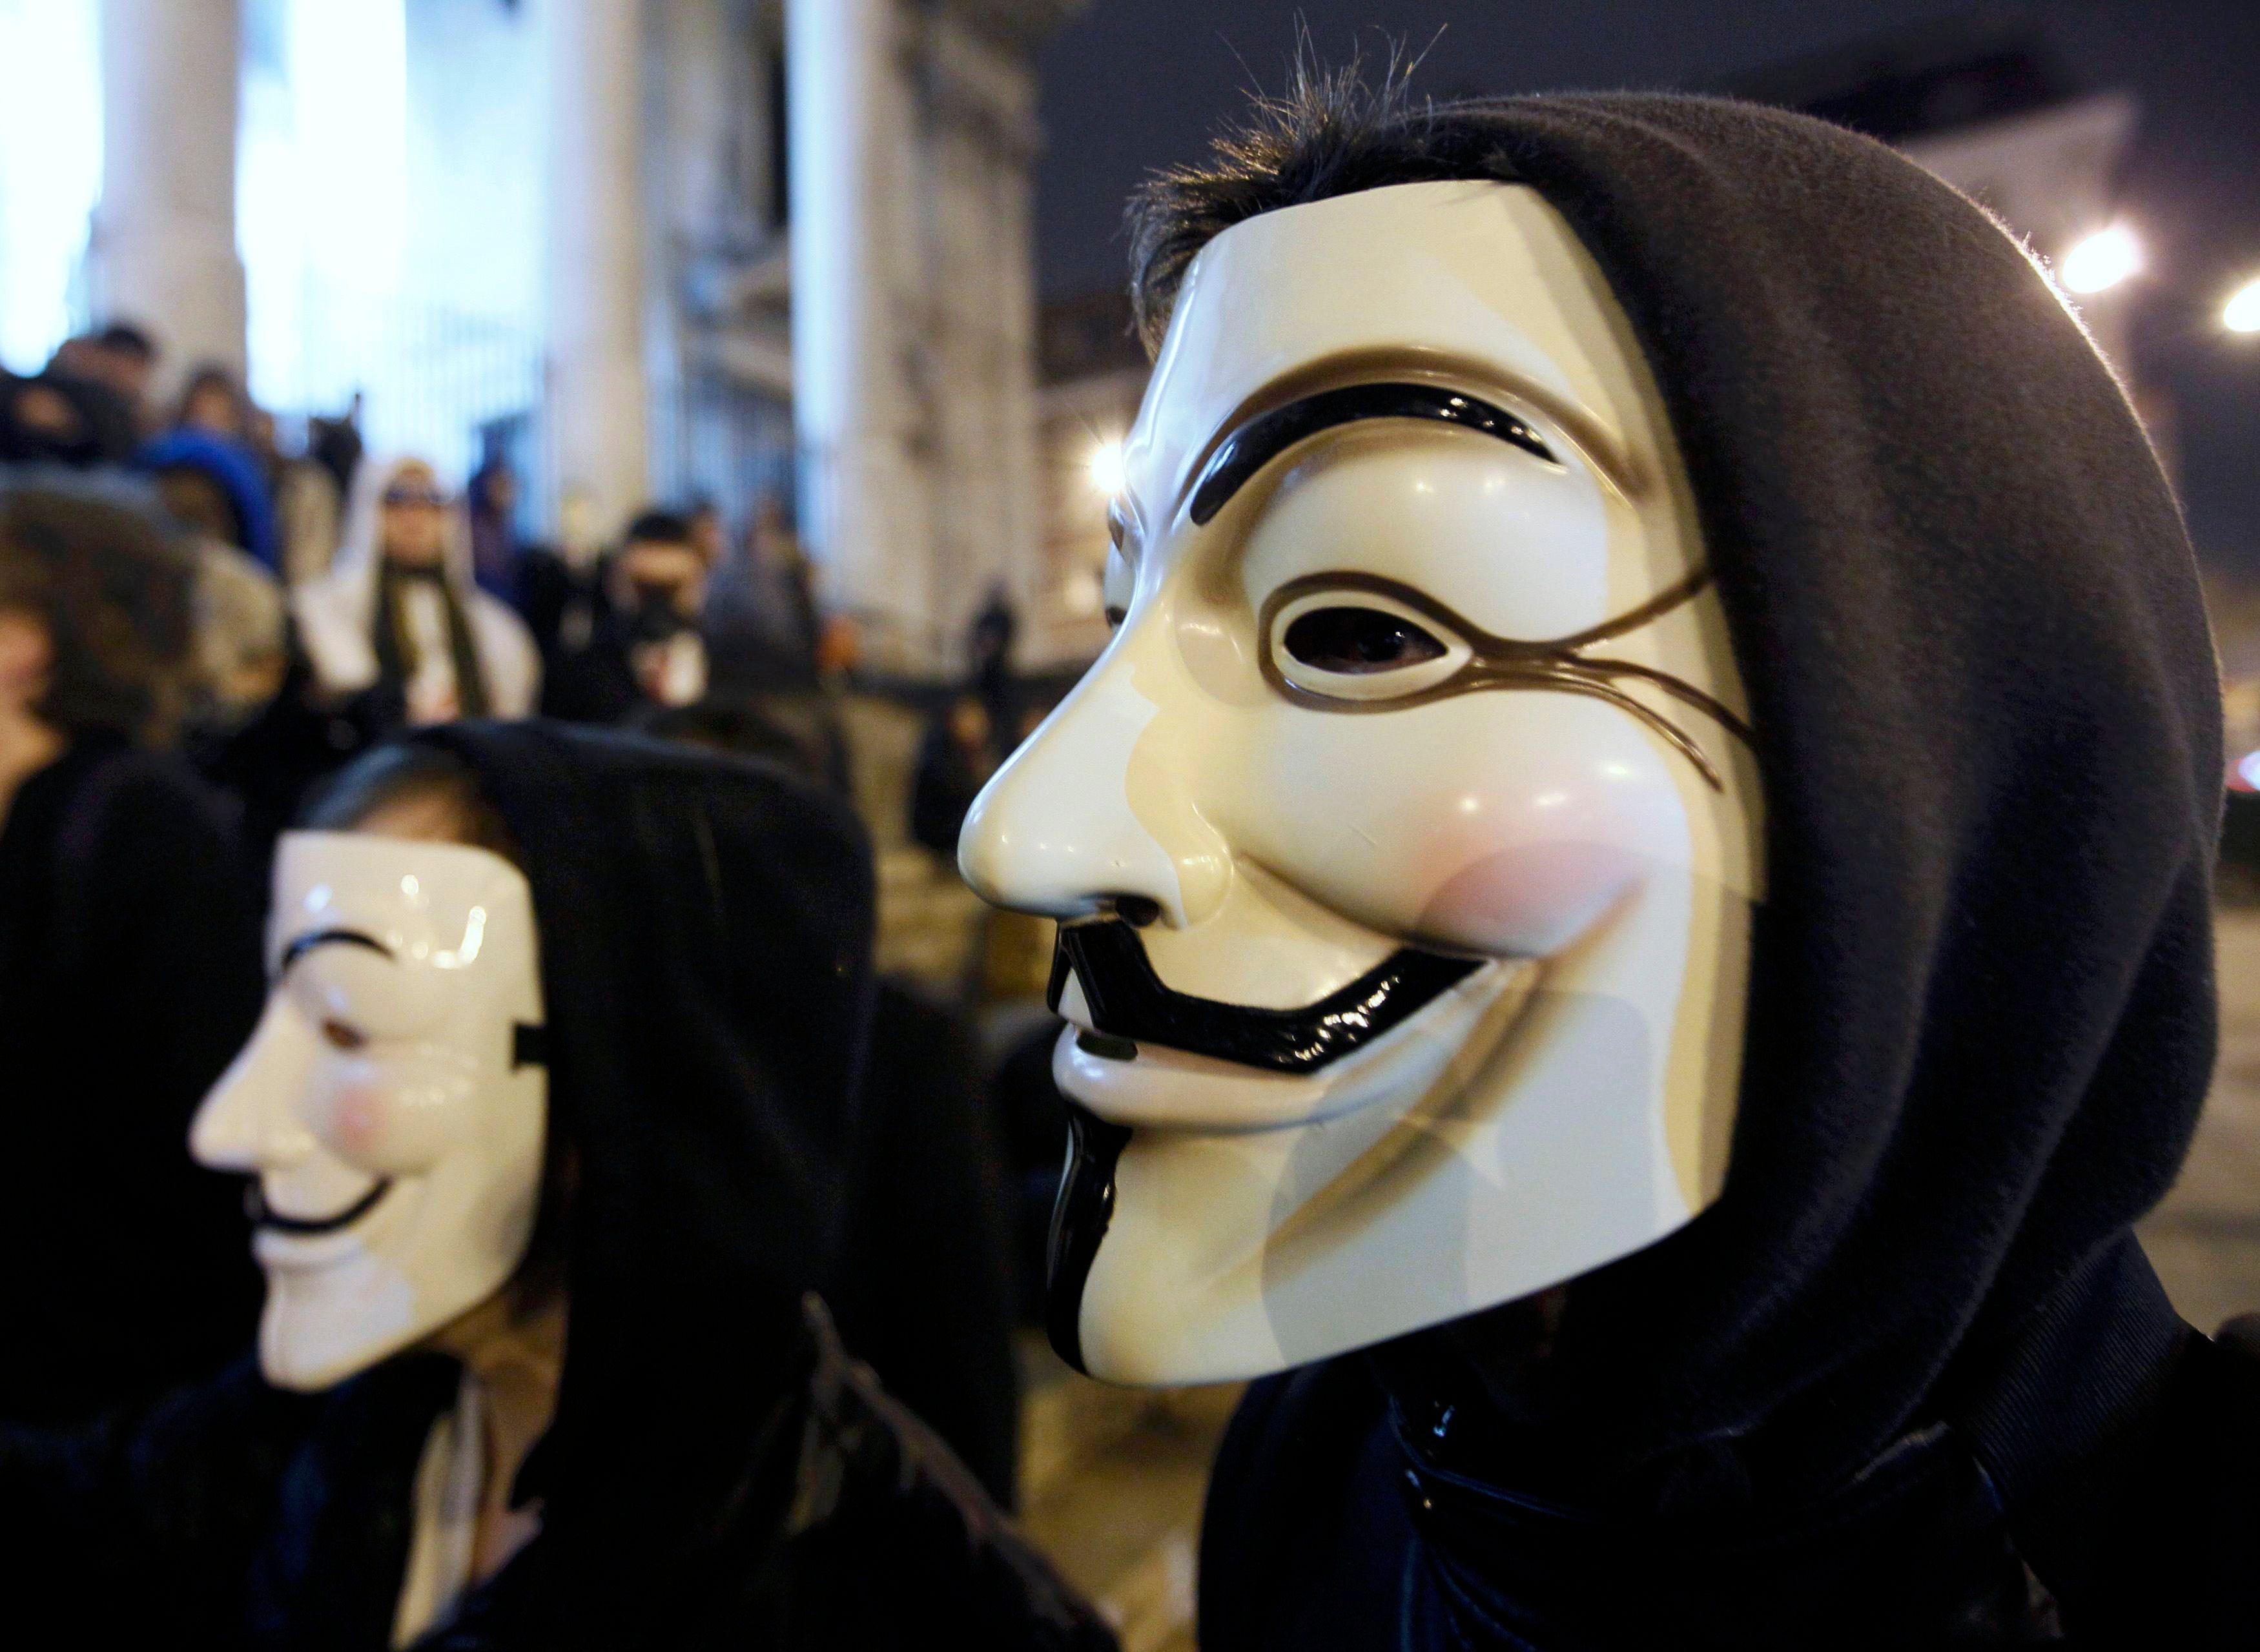 Charlie Hebdo : les Anonymous piratent des sites djihadistes